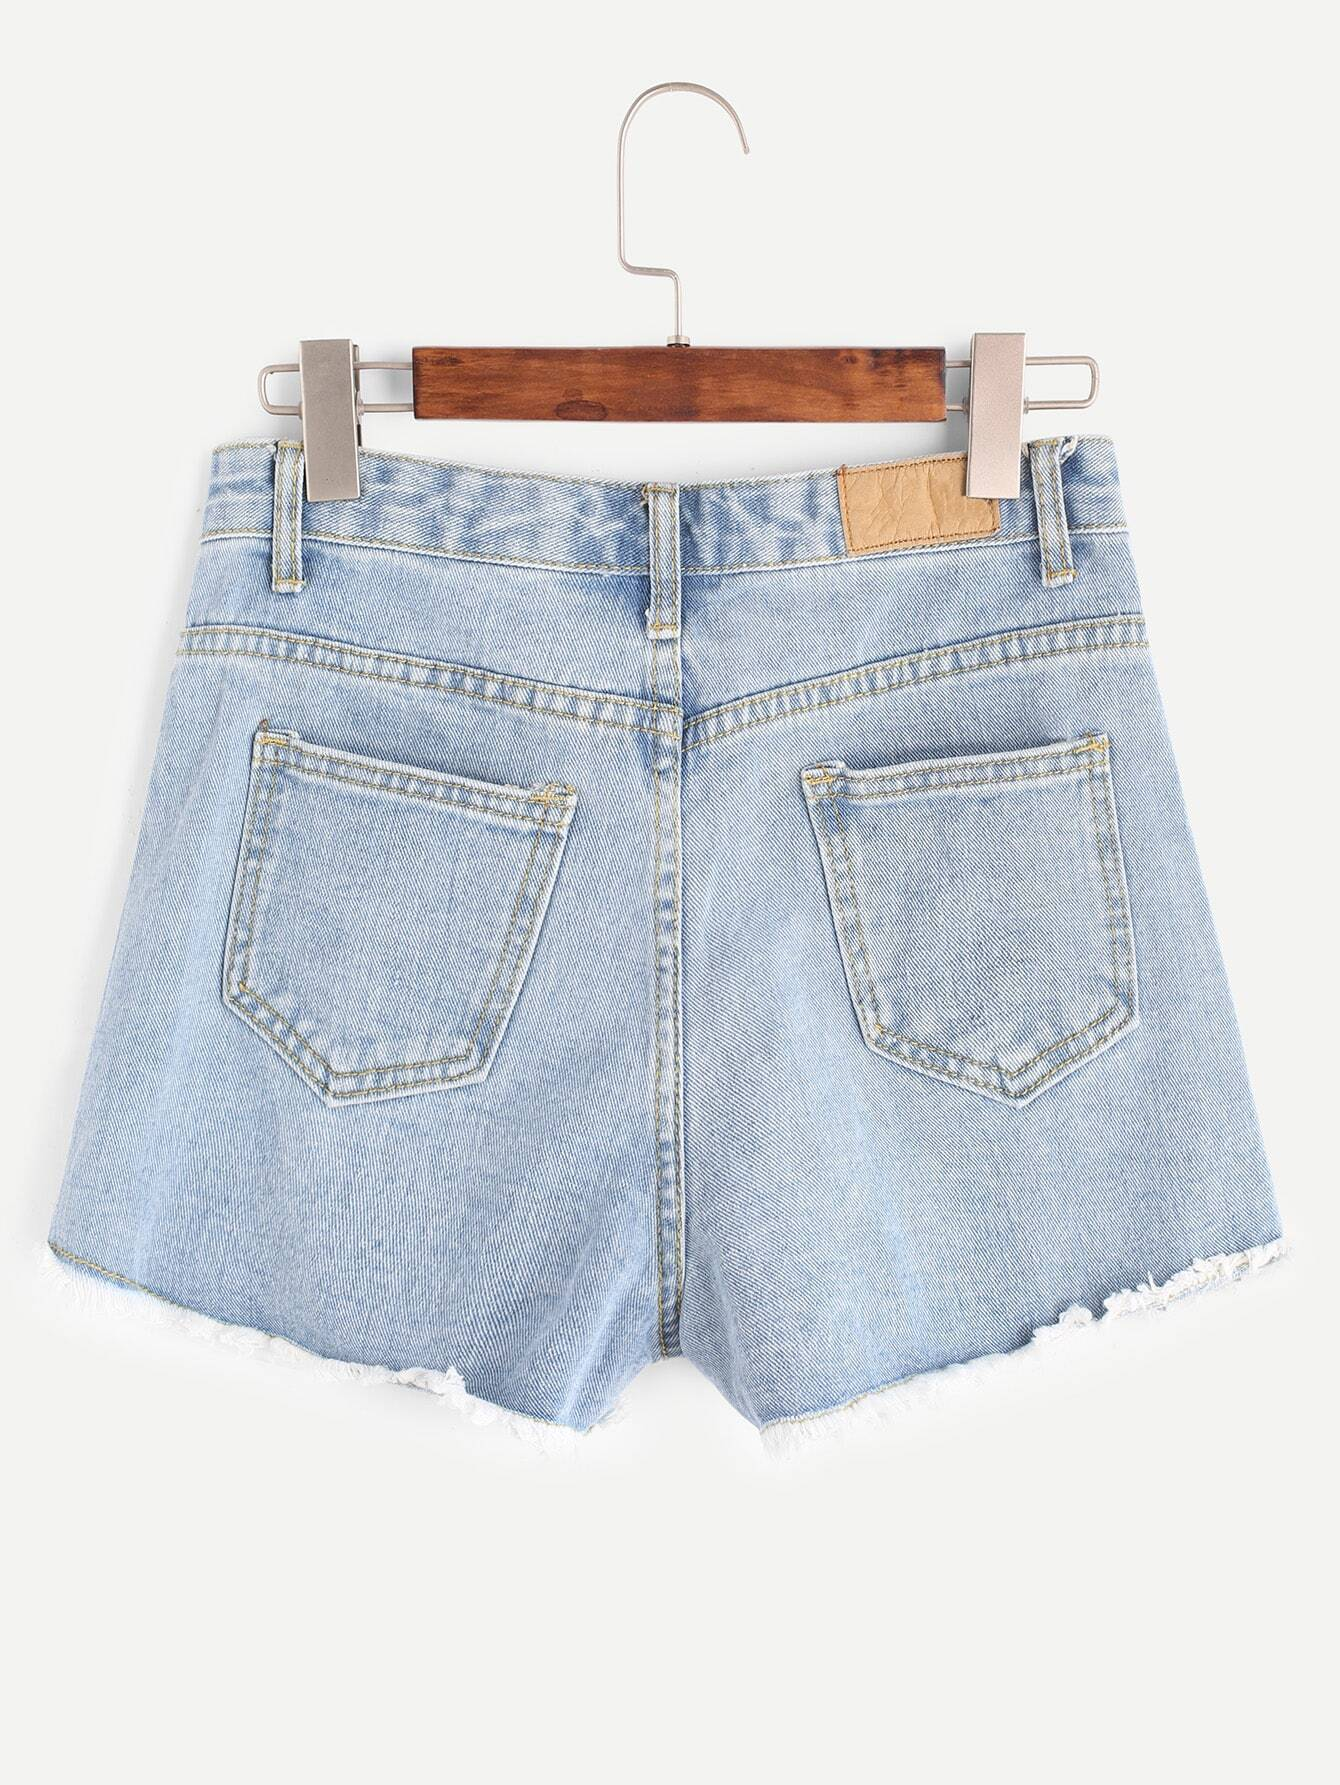 shorts170227004_2